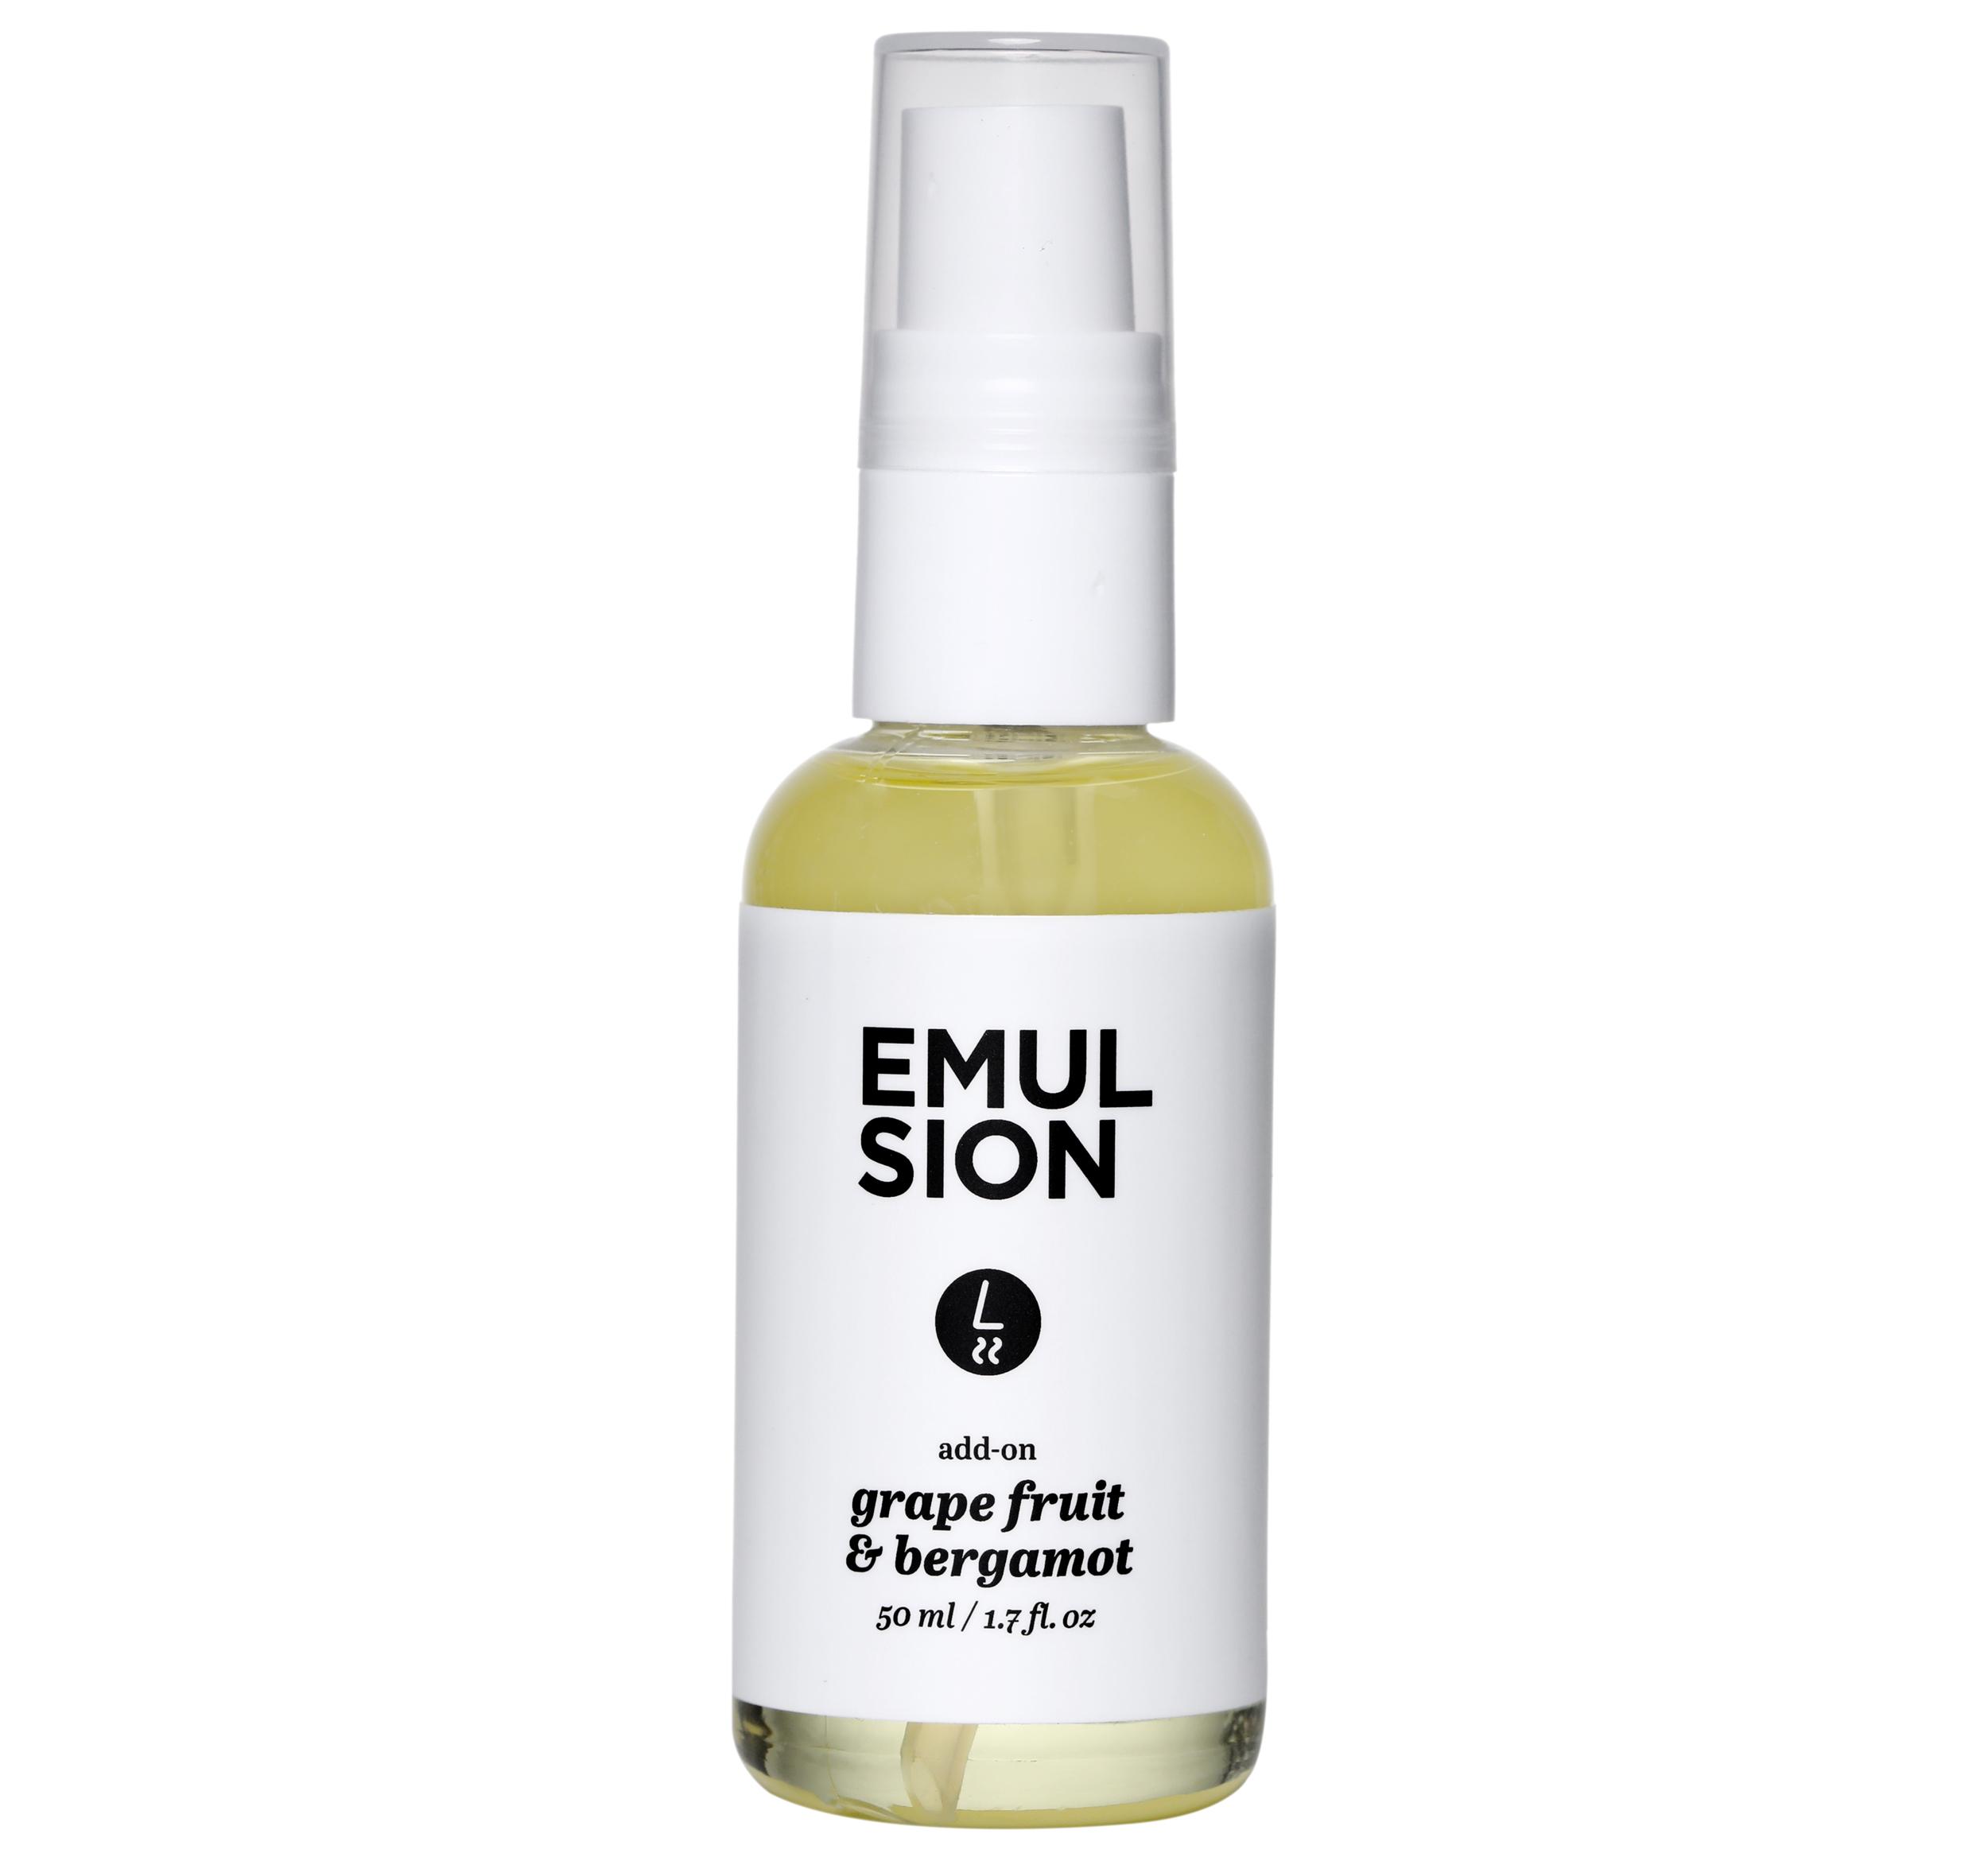 Emulsion Grapefuit and Bergamot Fragrance, £16/AED71.20